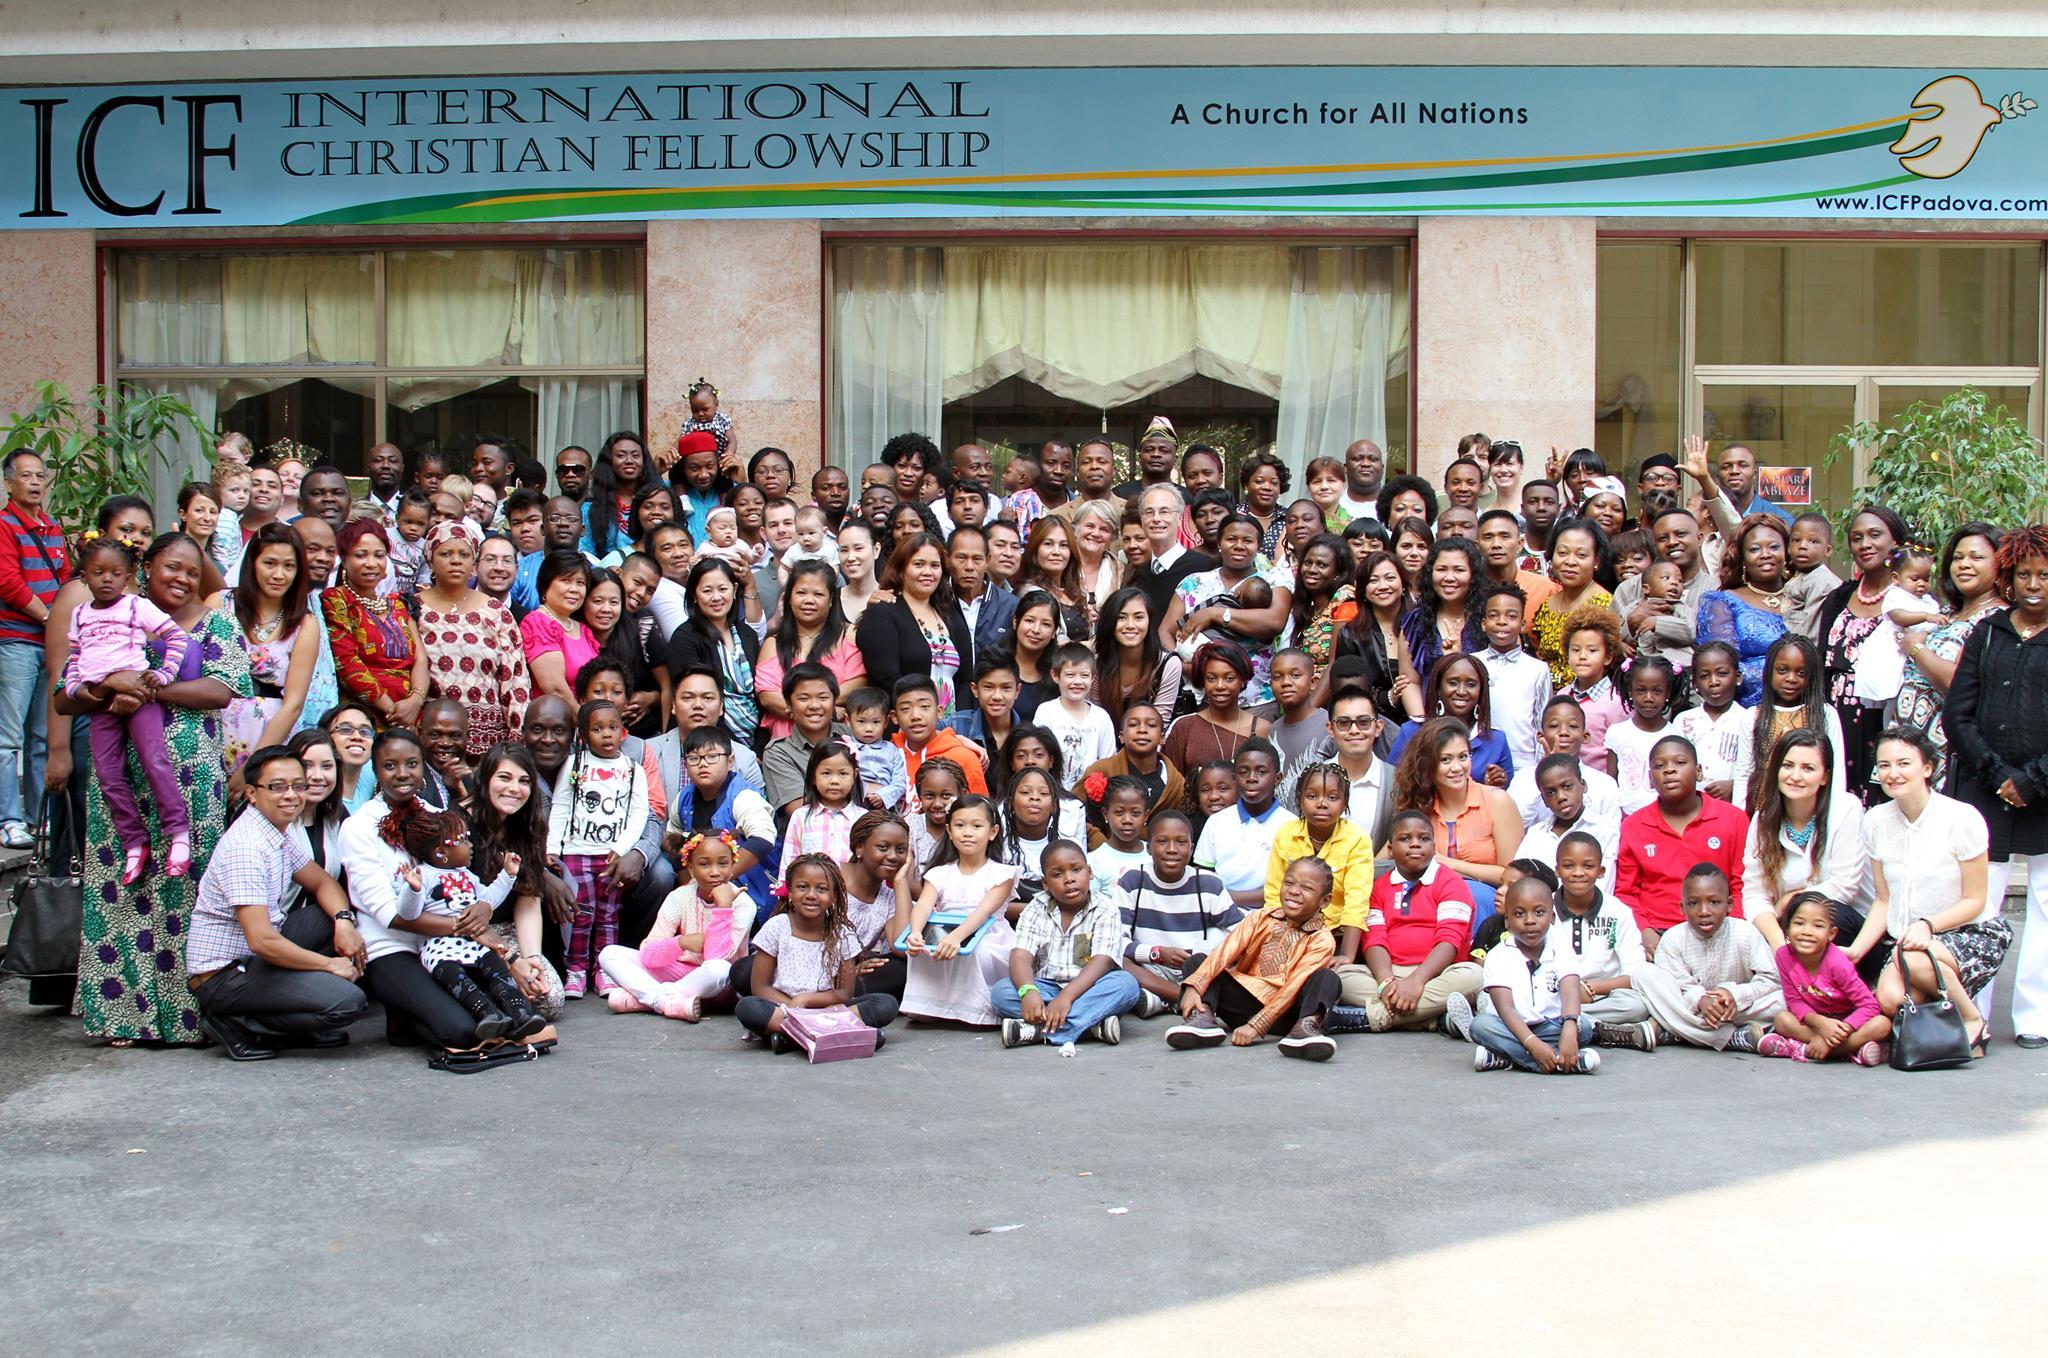 ICF - International Christian Fellowship in Padova, ItalyMore Info…